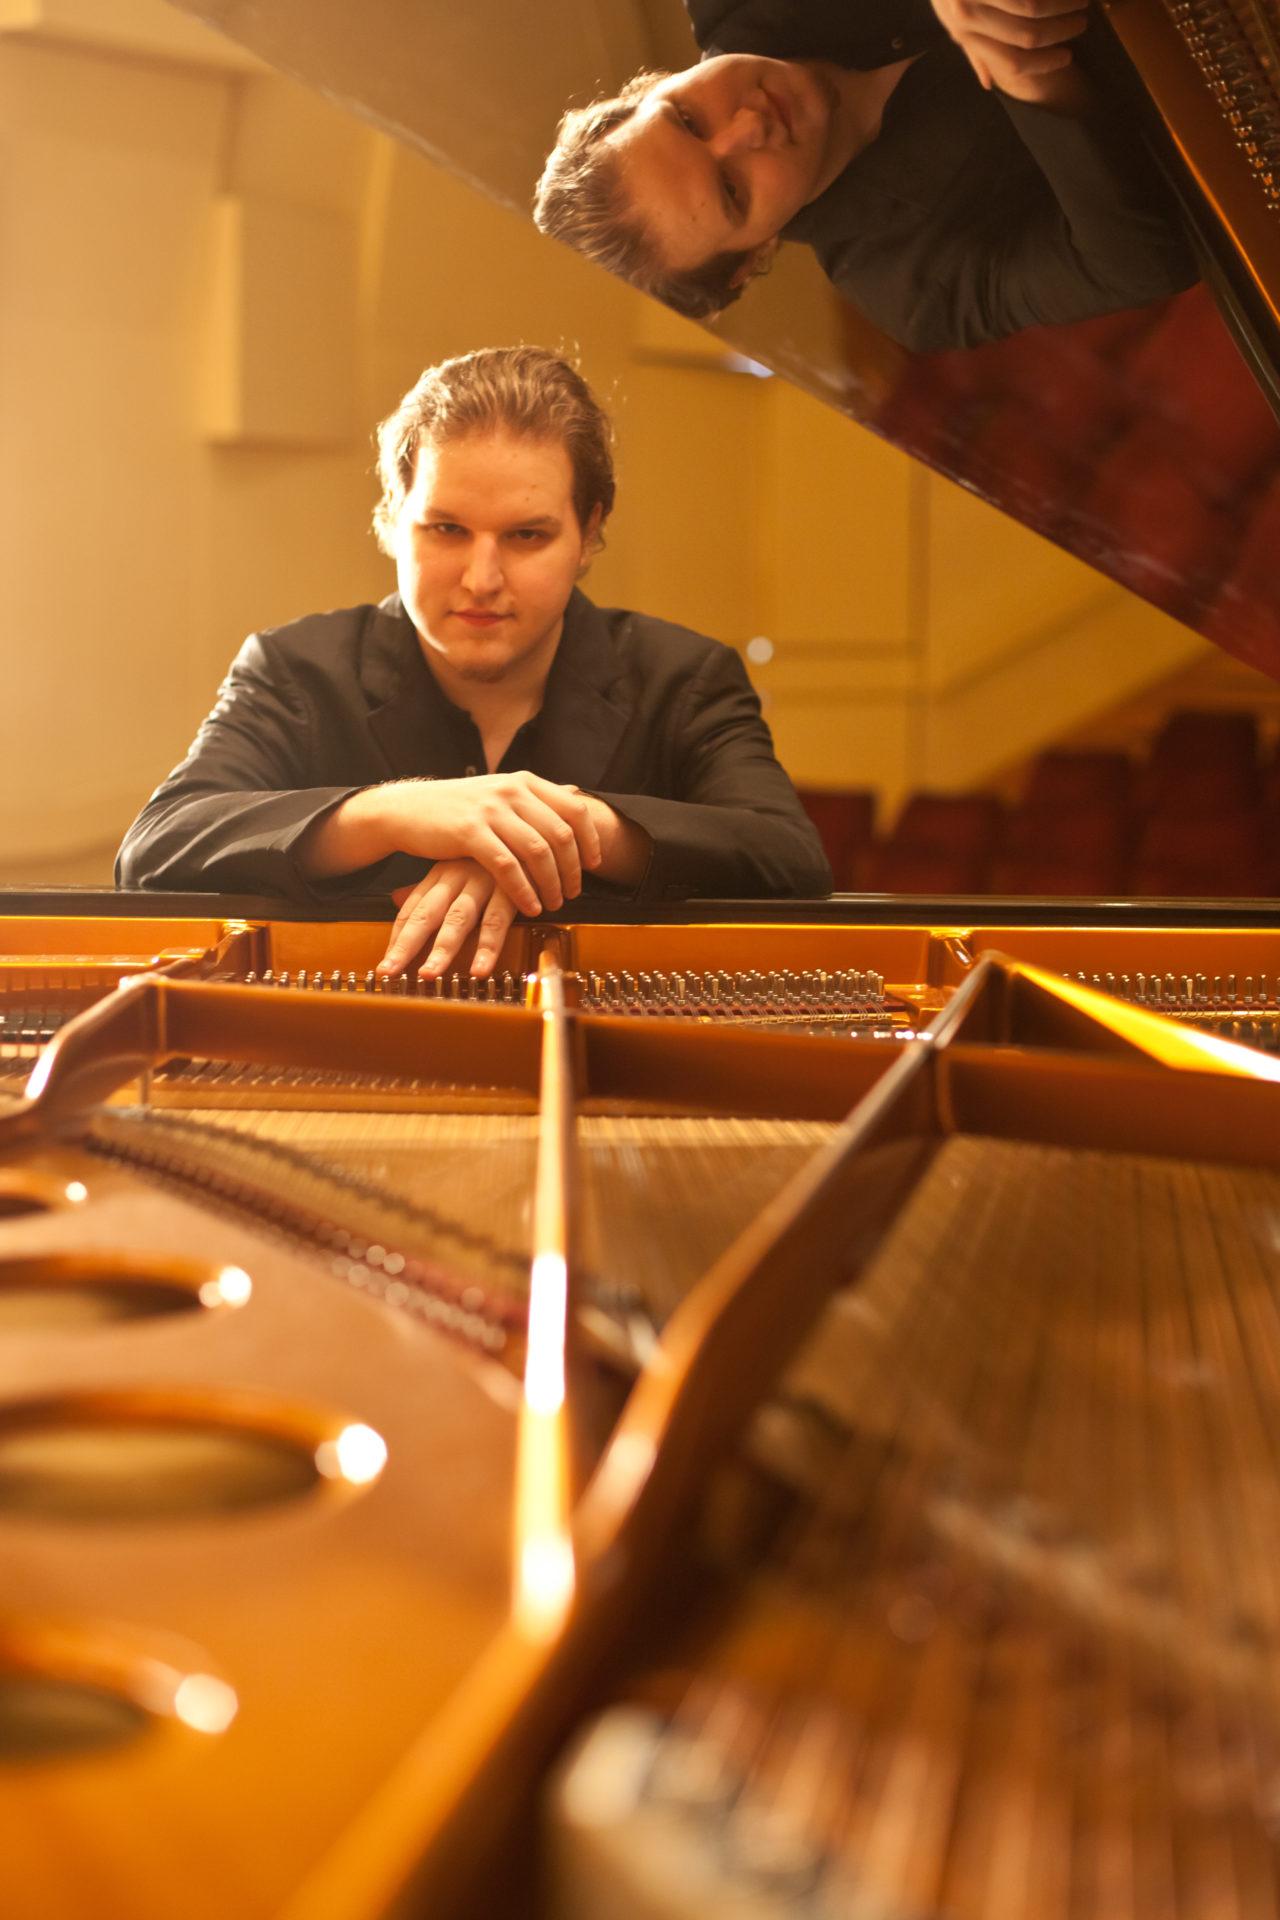 Klavierissimo: Lukáš Vondráček